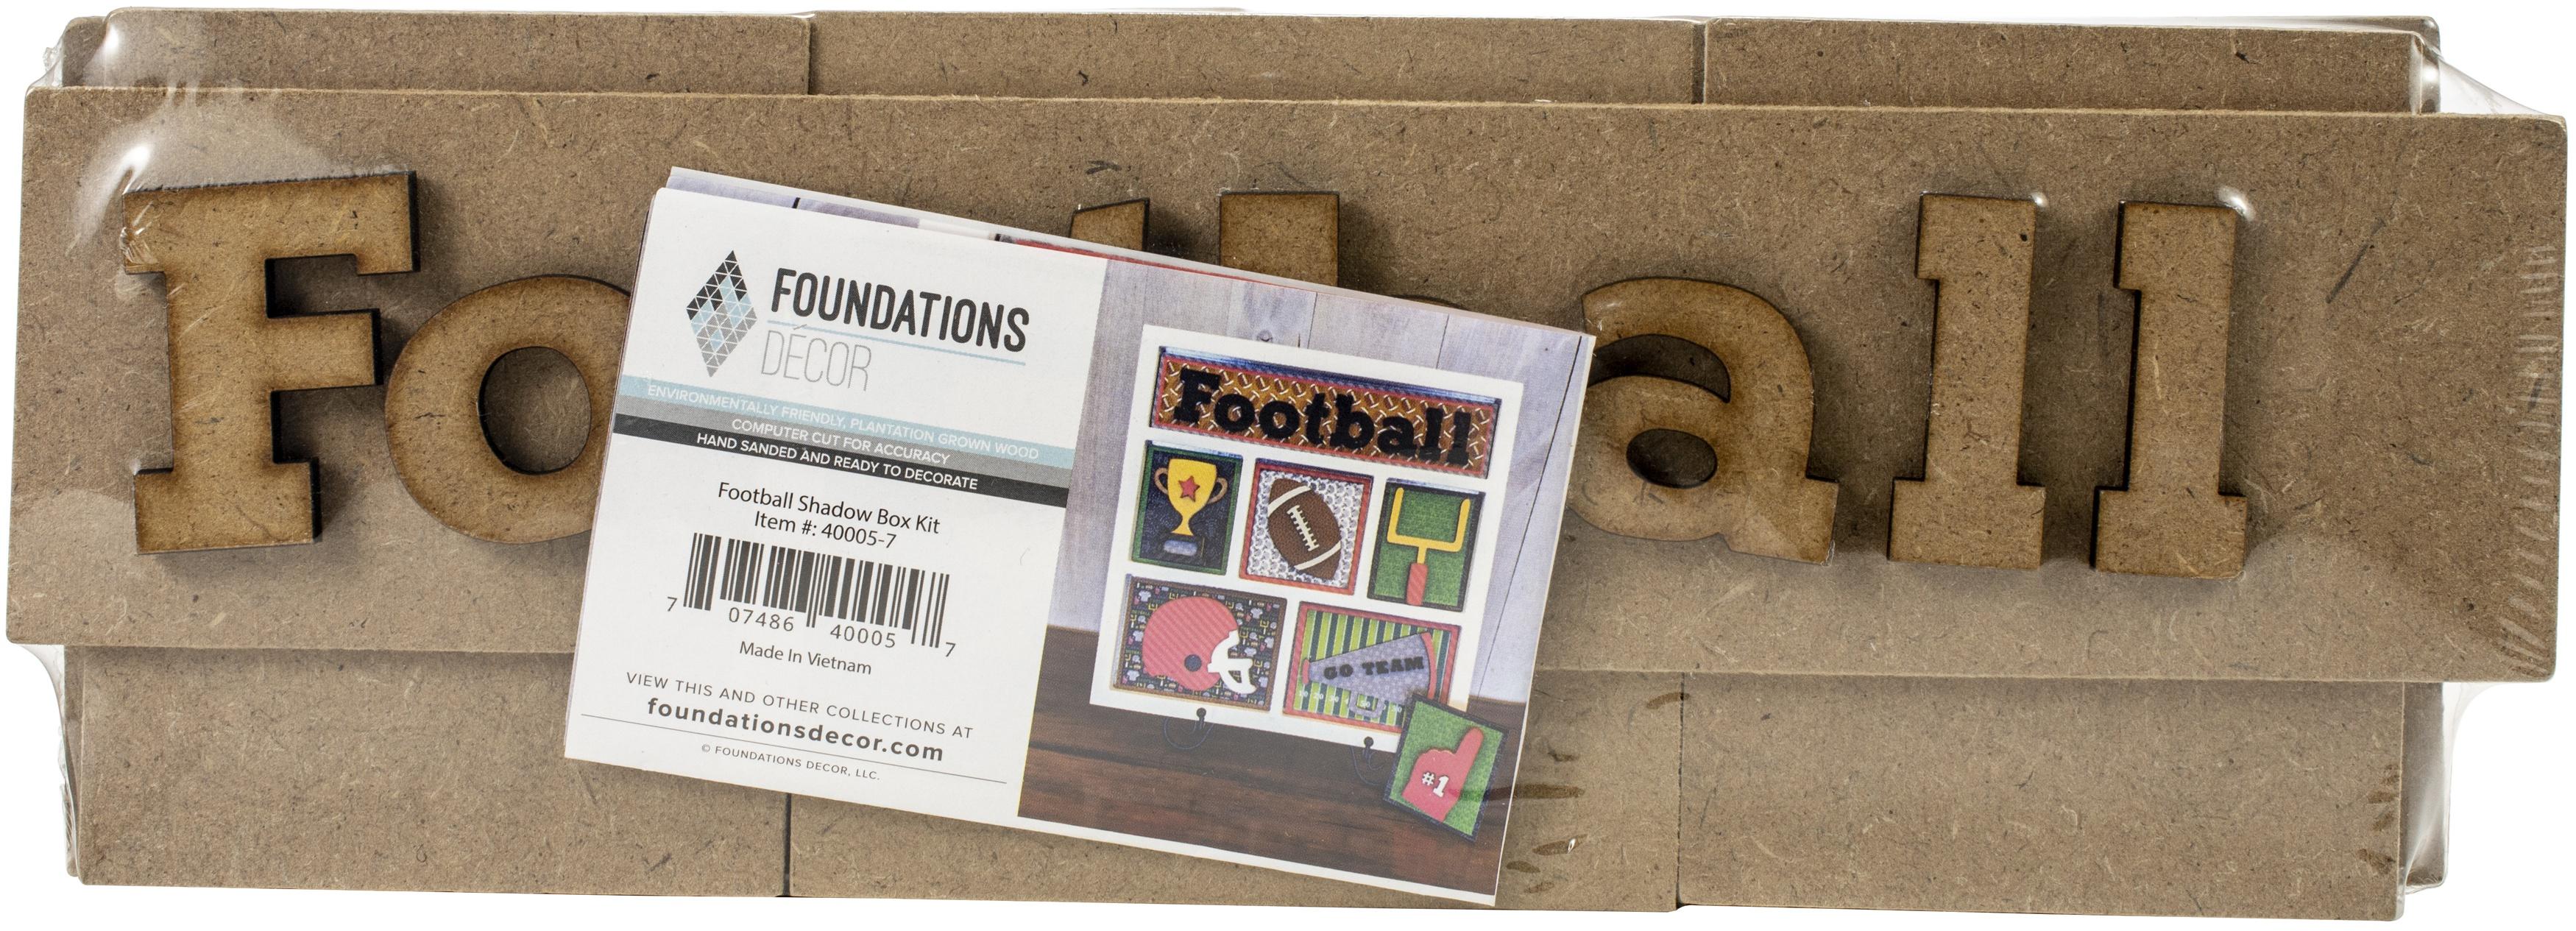 Football Shadow Box kit